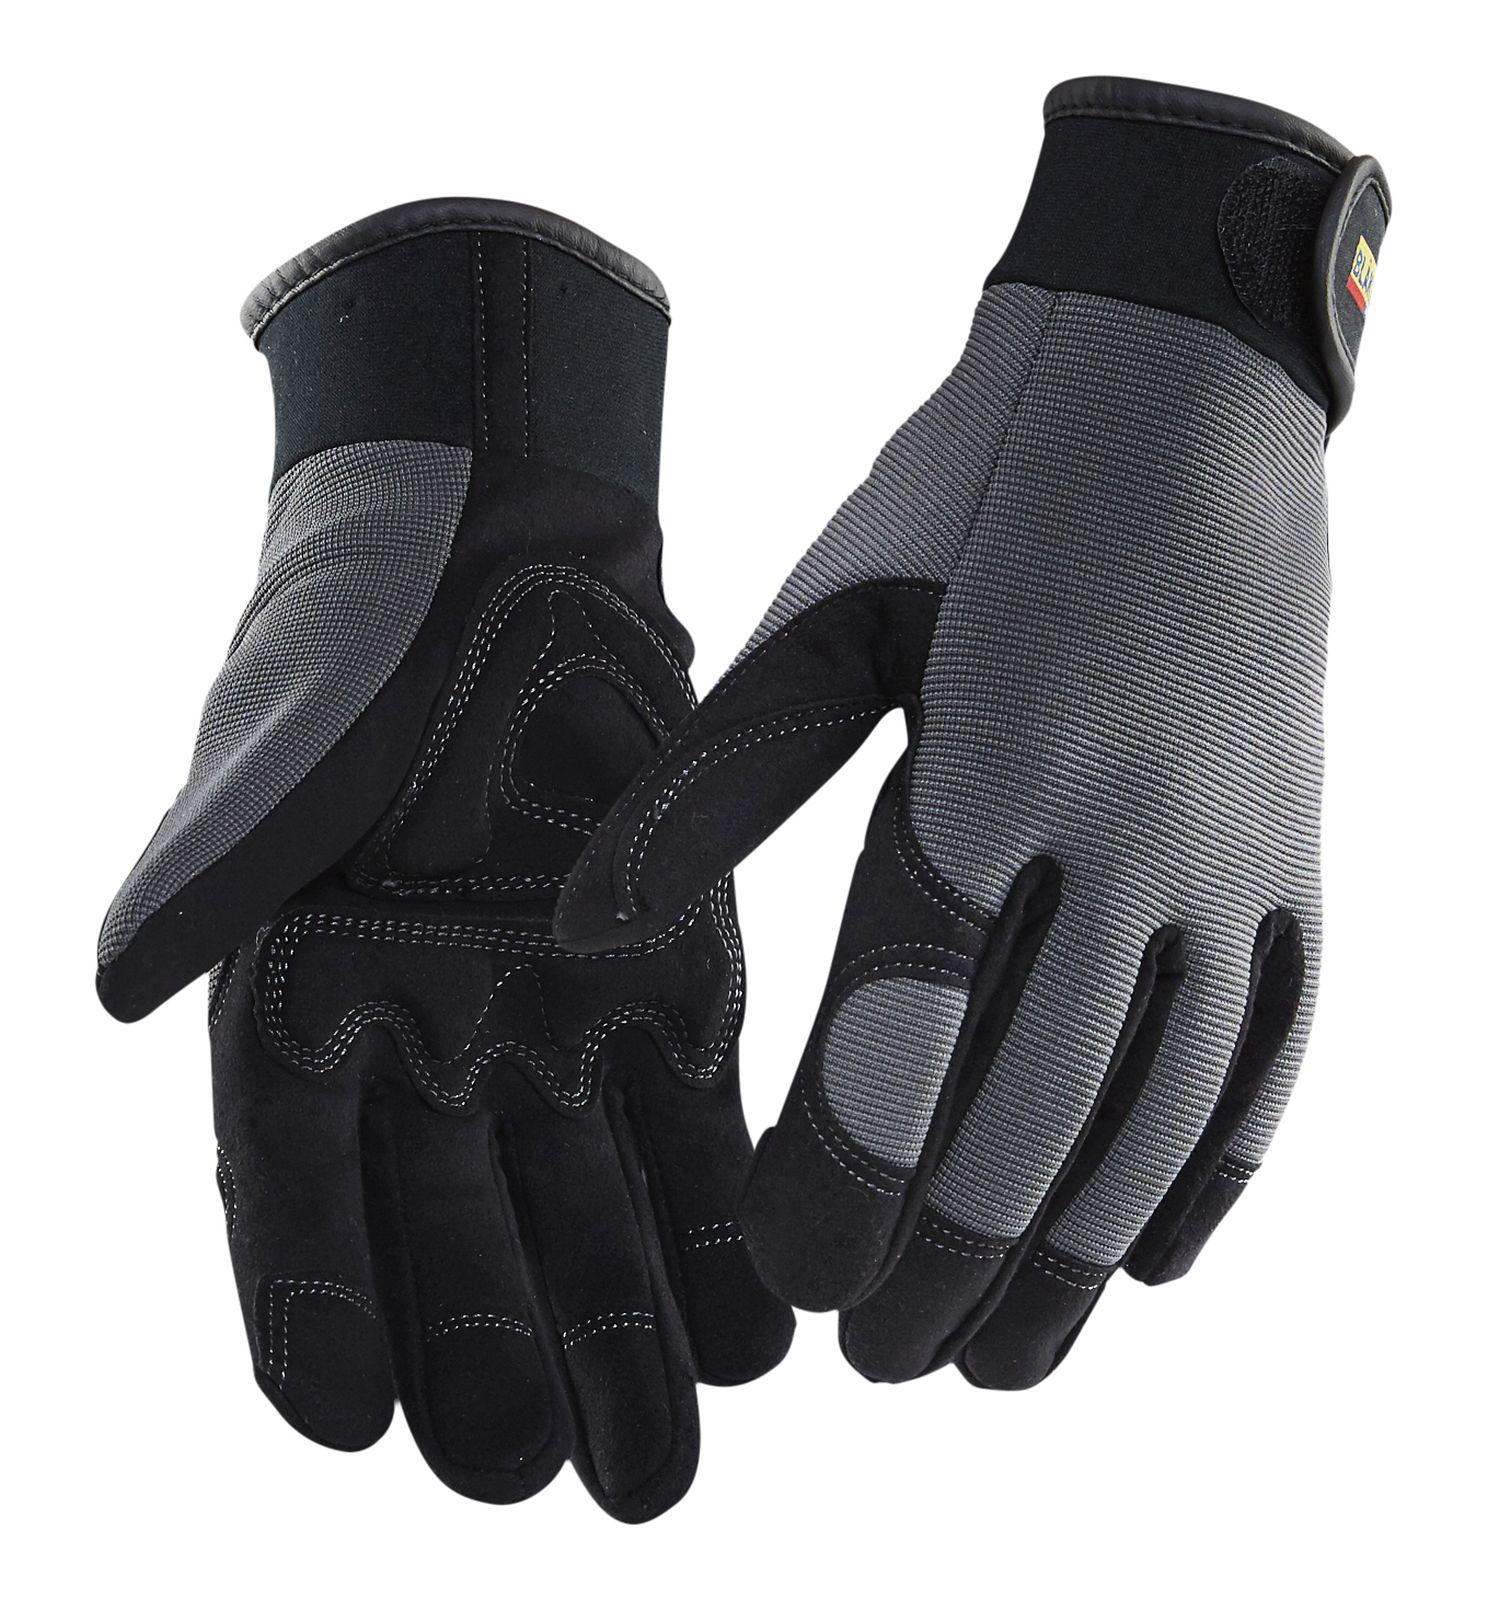 Blaklader Werkhandschoenen 22353915 zwart-grijs(9994)